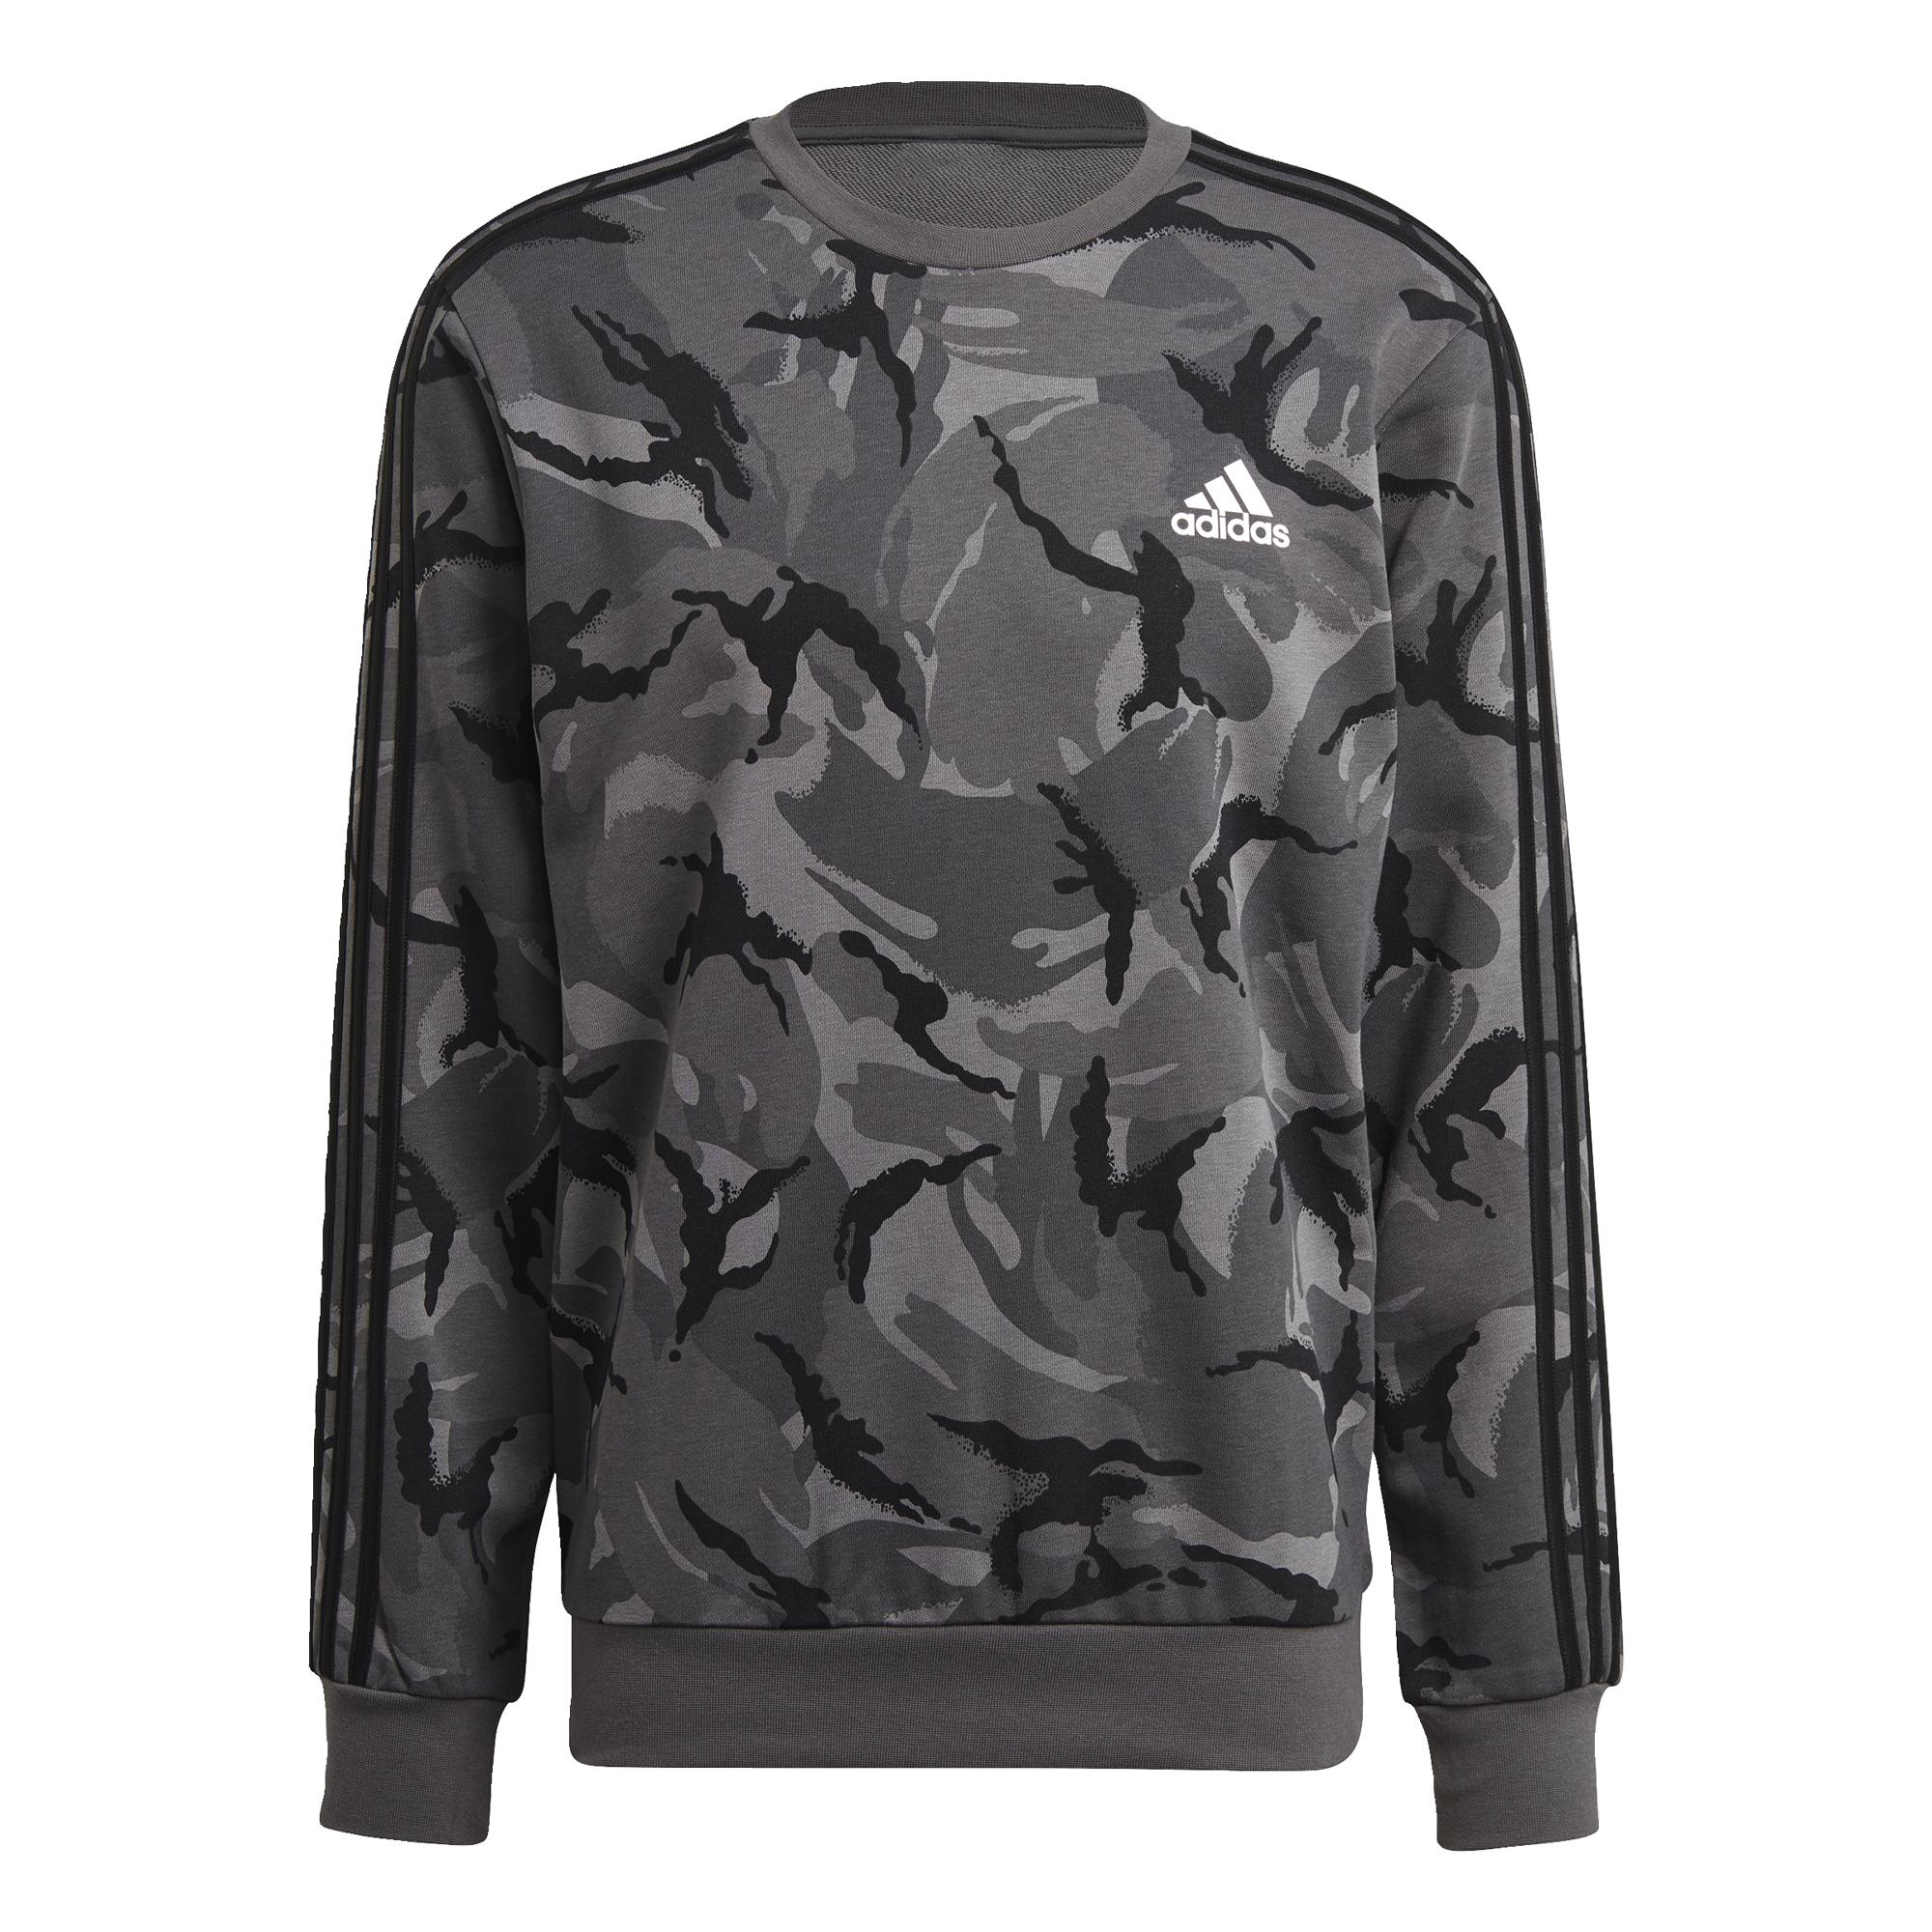 thumbnail 15 - adidas Essentials Camouflage Crew Sweatshirt Men's Sweatshirts